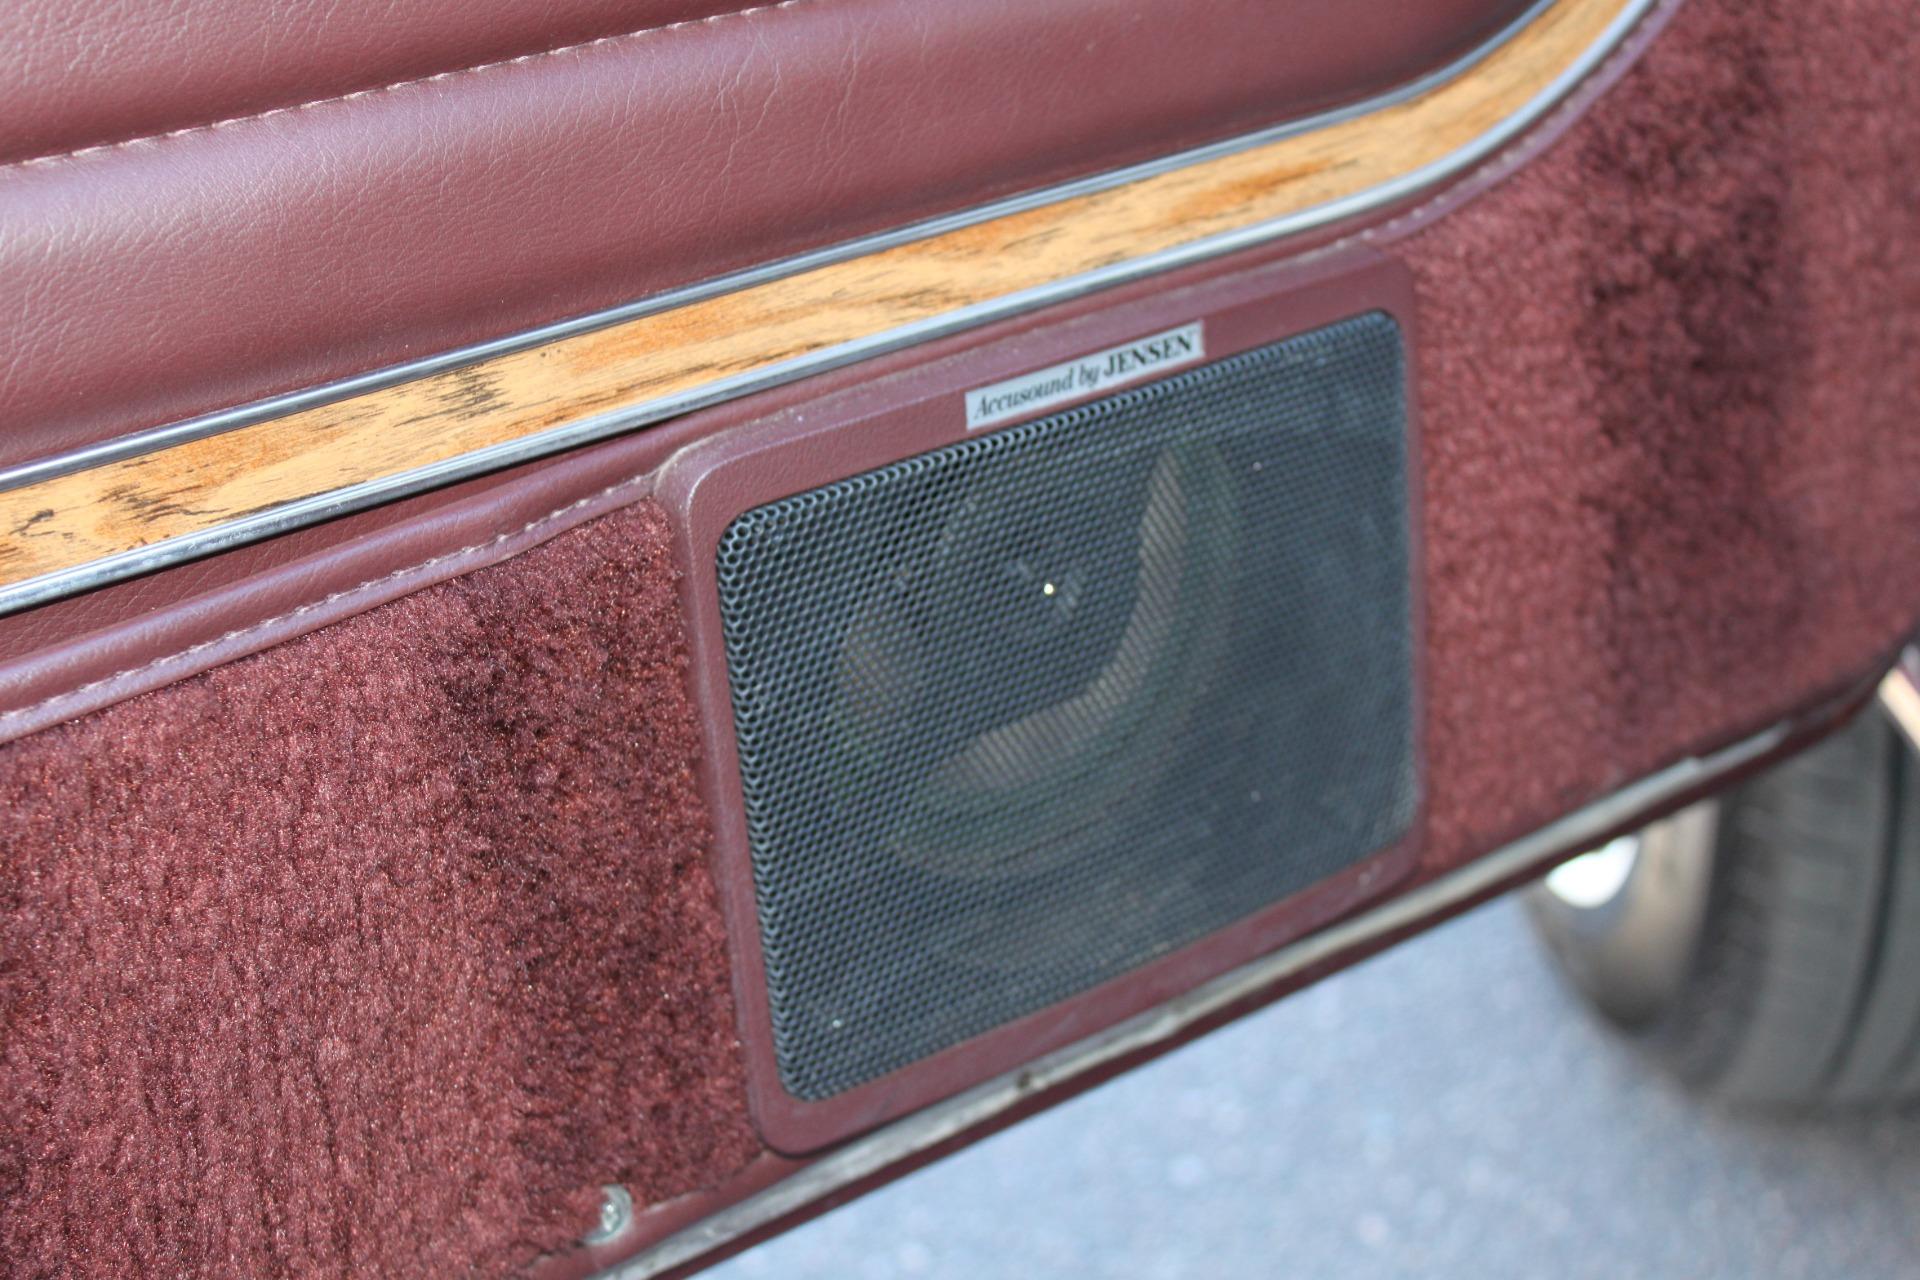 Used-1988-Jeep-Grand-Wagoneer-Grand-Wagoneer